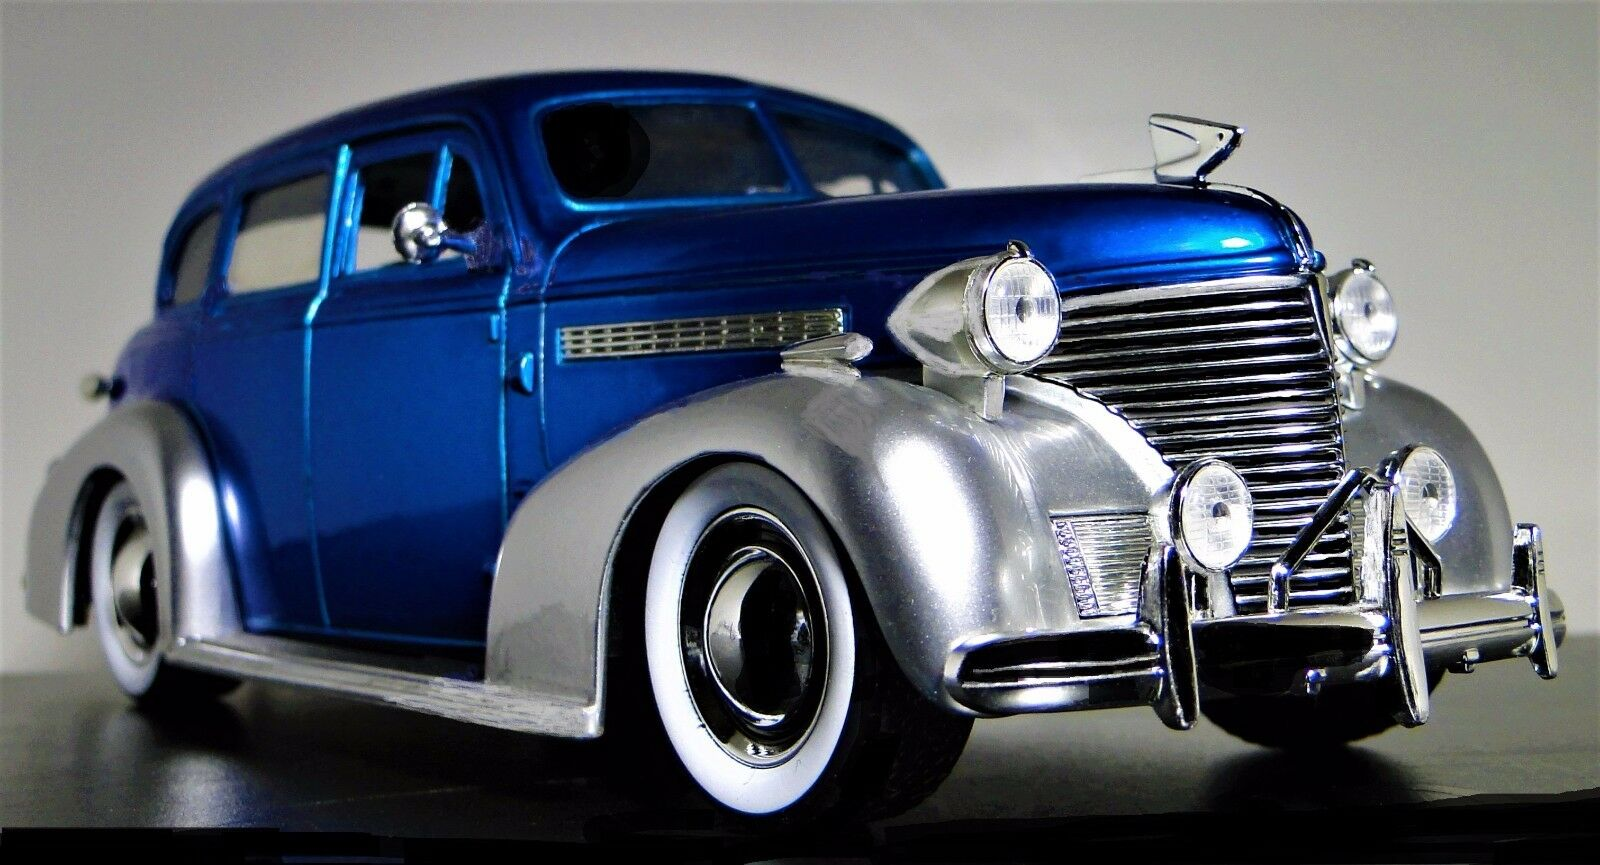 1 Camioneta Ford 1930s Modelo De Metal De Coche Antiguo Vintage 43 12 F150 T 24 18